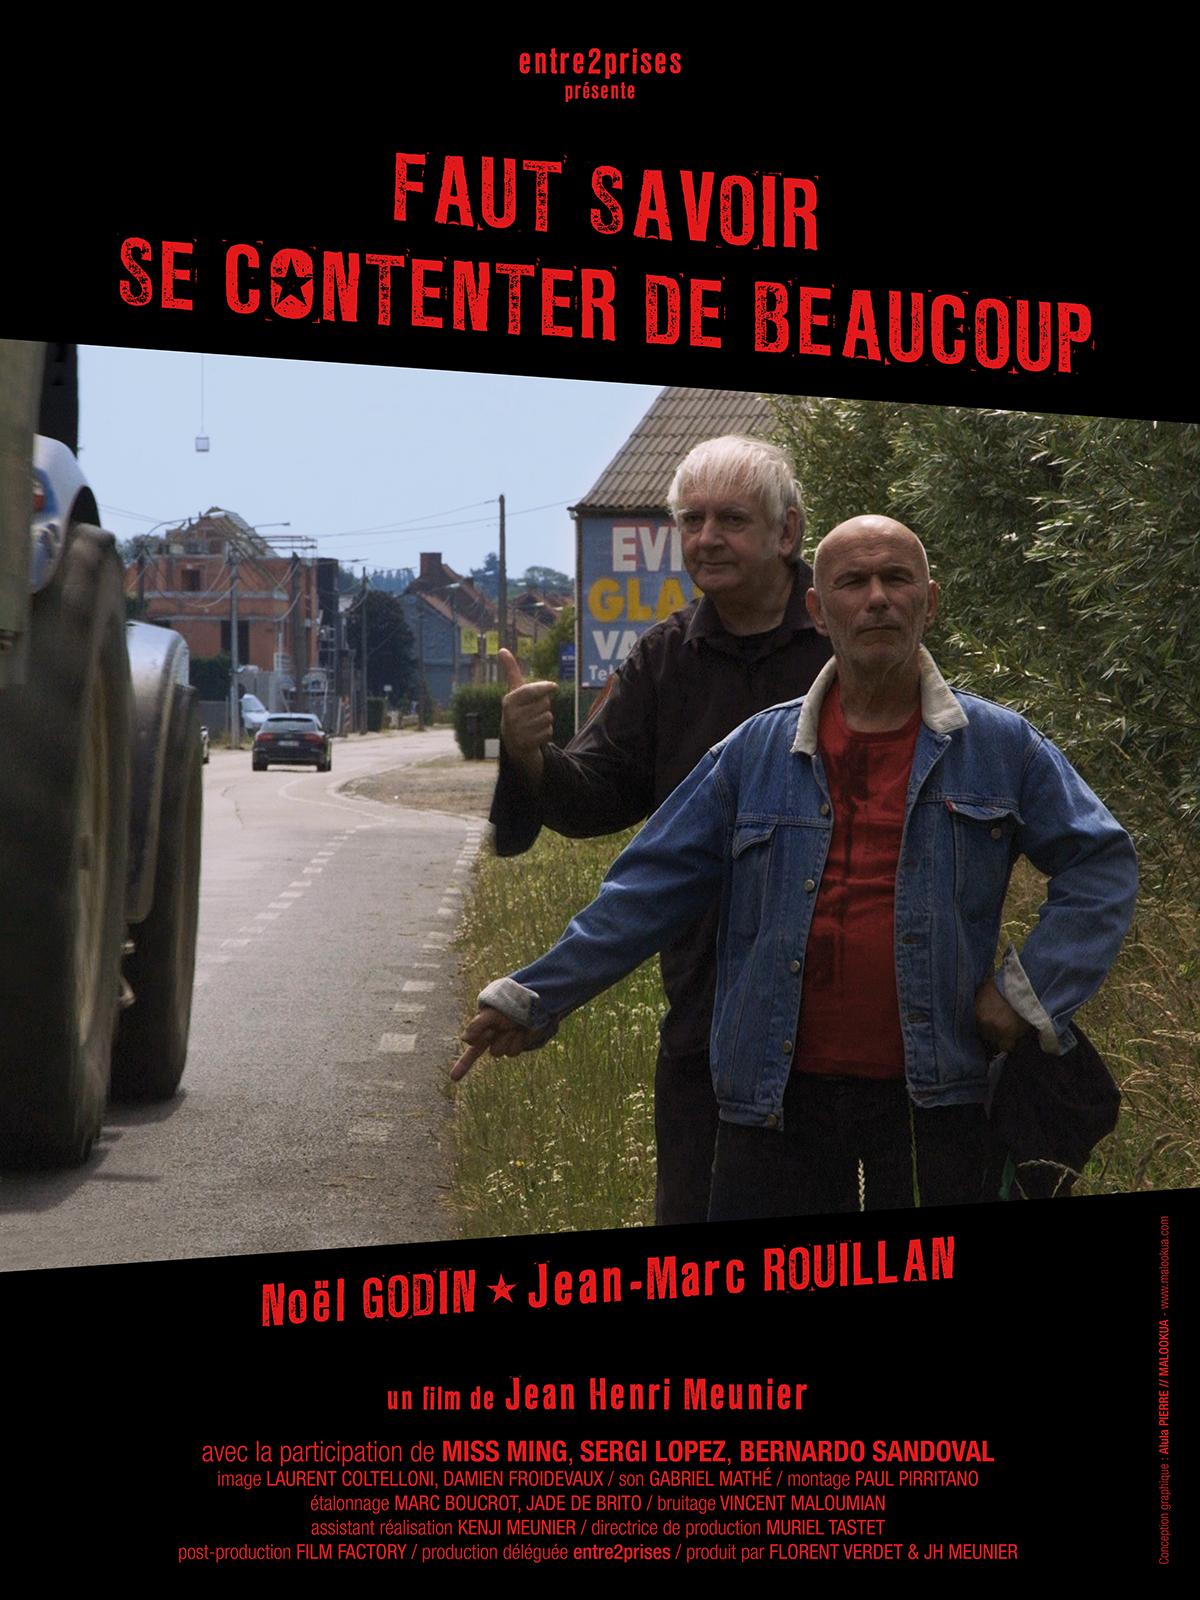 http://rss.allocine.fr/~r/ac/cine/cettesemaine/~3/gWdDWBNxGGk/story01.htm